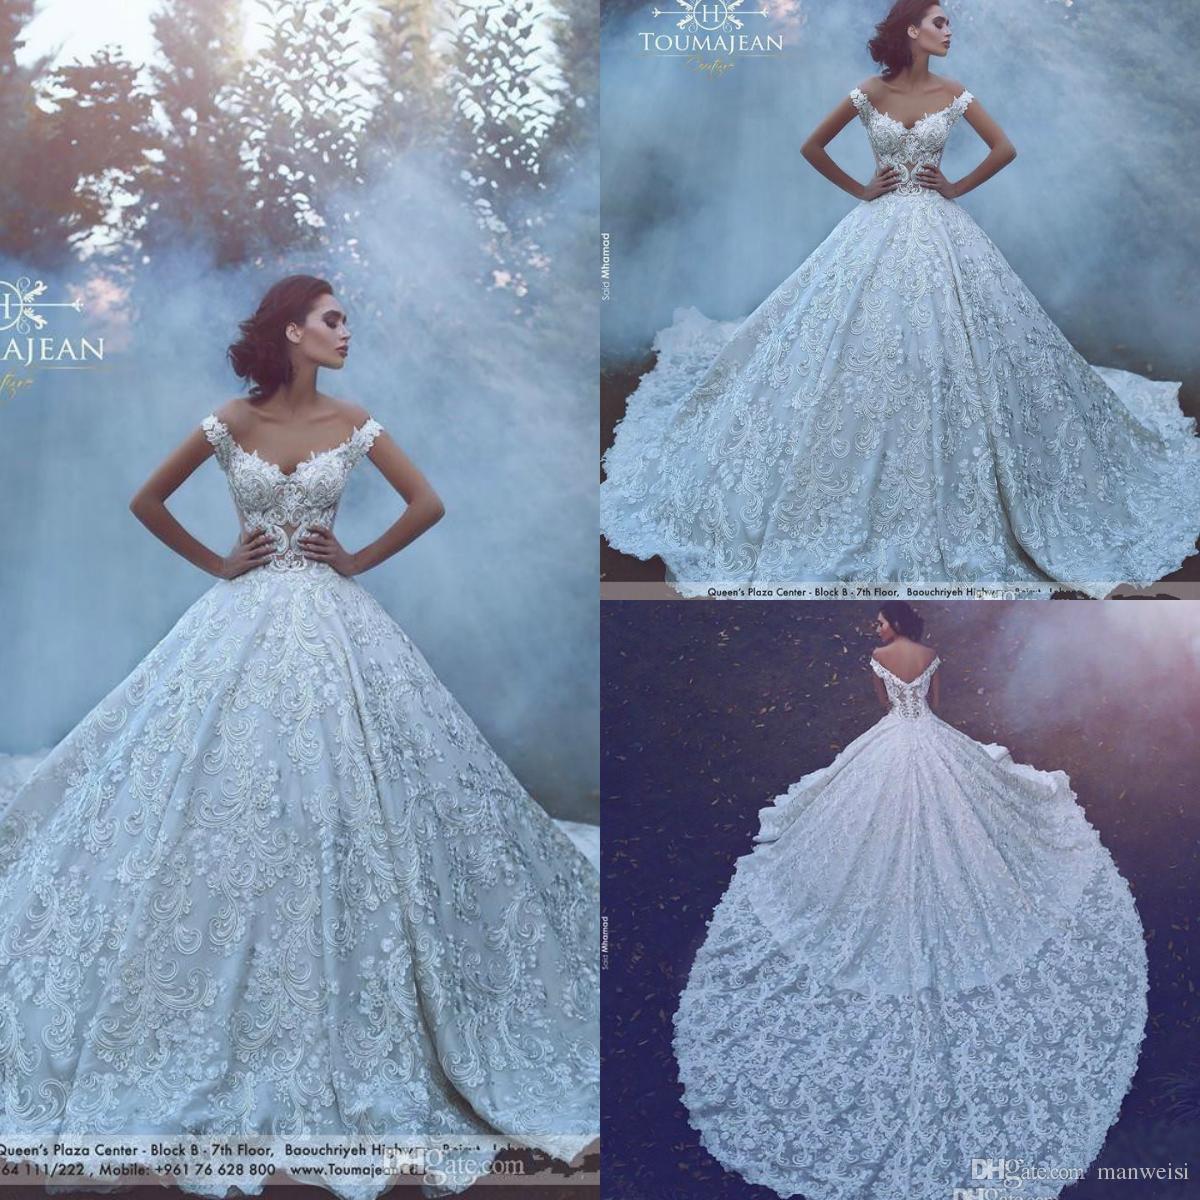 Luxury Princess Wedding Dresses 51 Off Awi Com,Wedding Dresses Catalogs Free By Mail